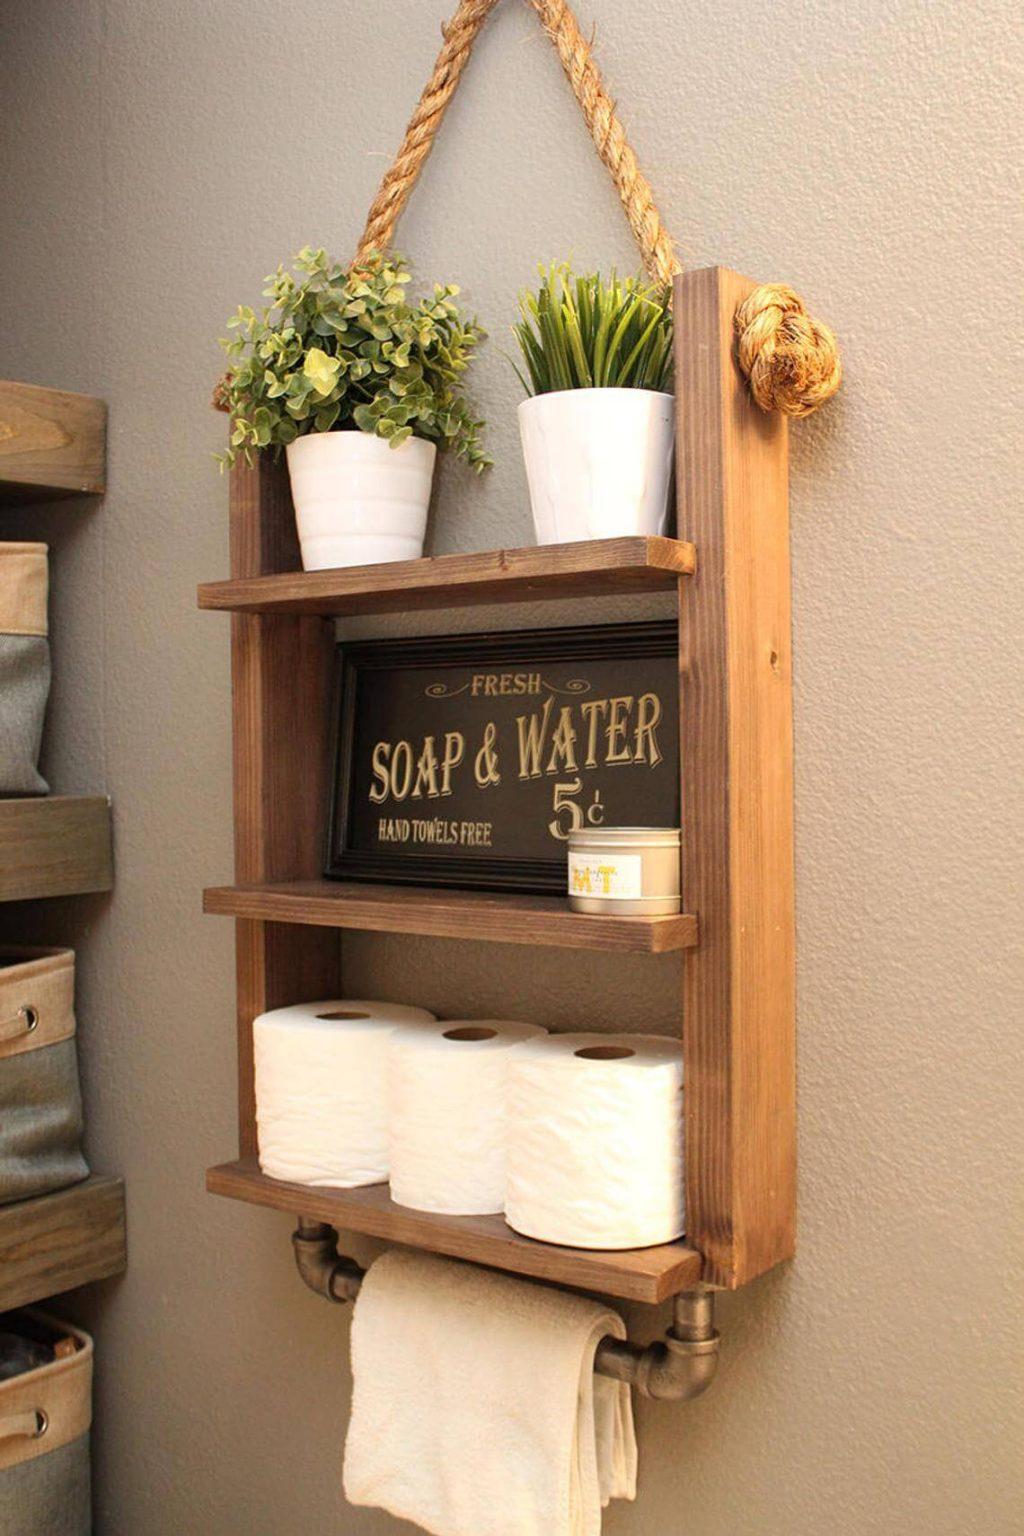 20f-best-rustic-bathroom-design-decor-ideas-homebnc-v5-1024x1536